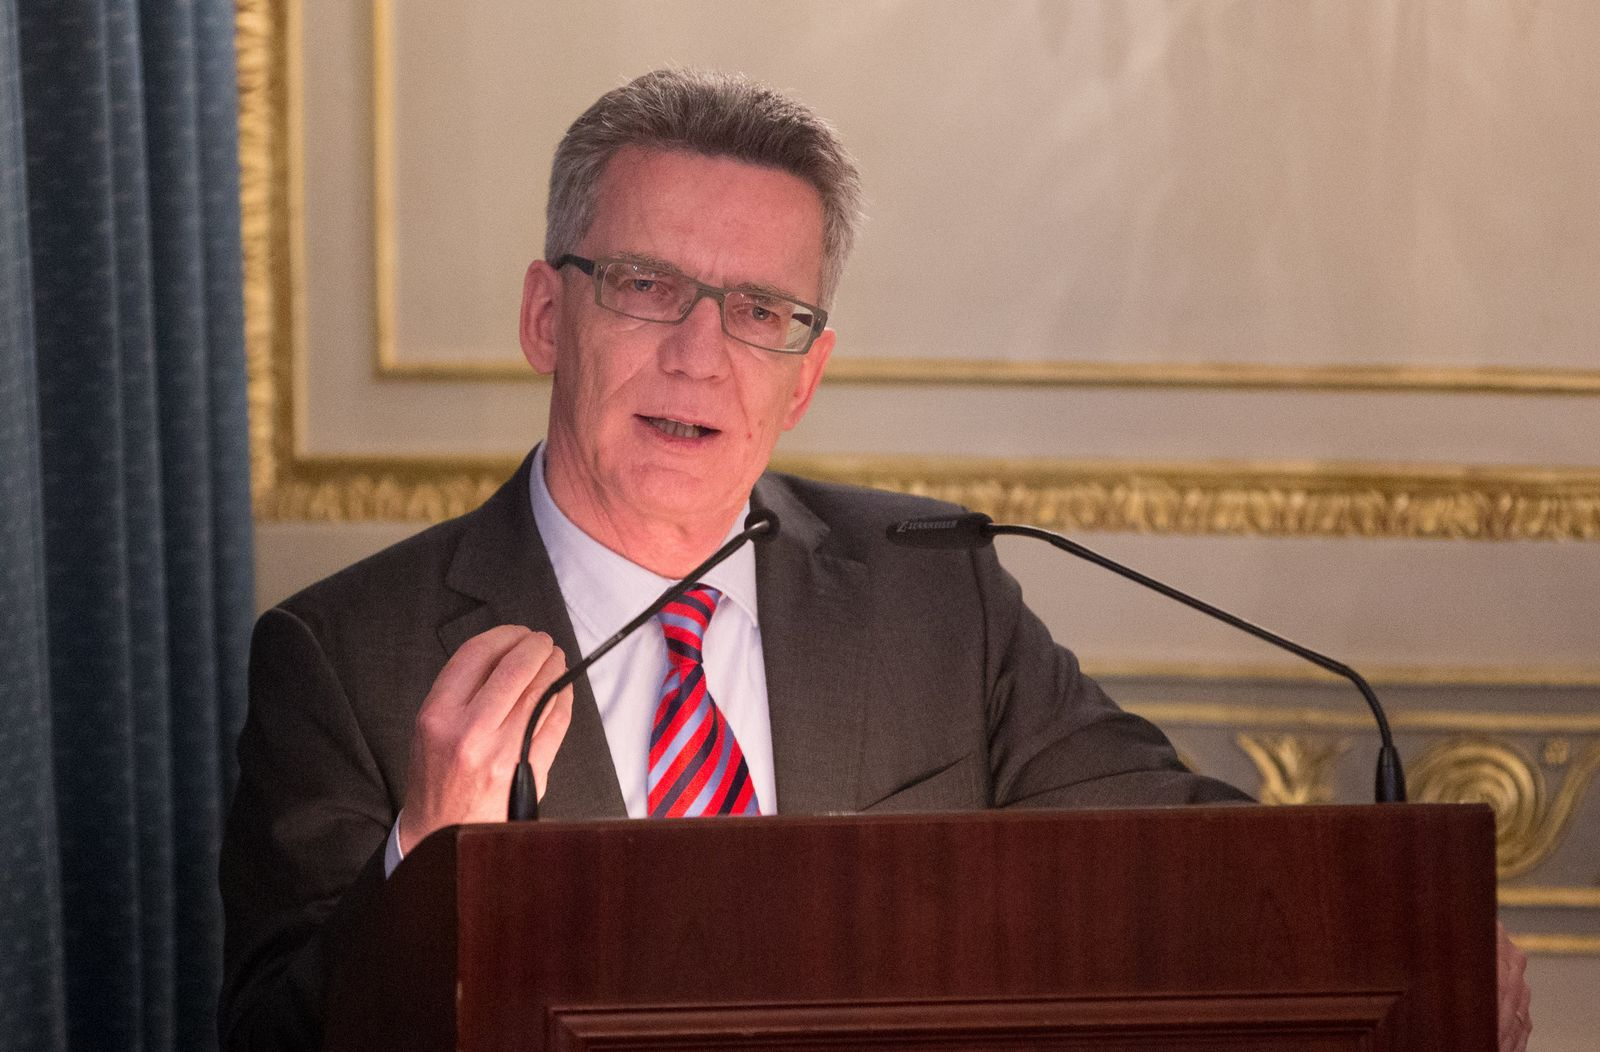 Thomas de Maizière diskutiert das Thema IT-Sicherheit